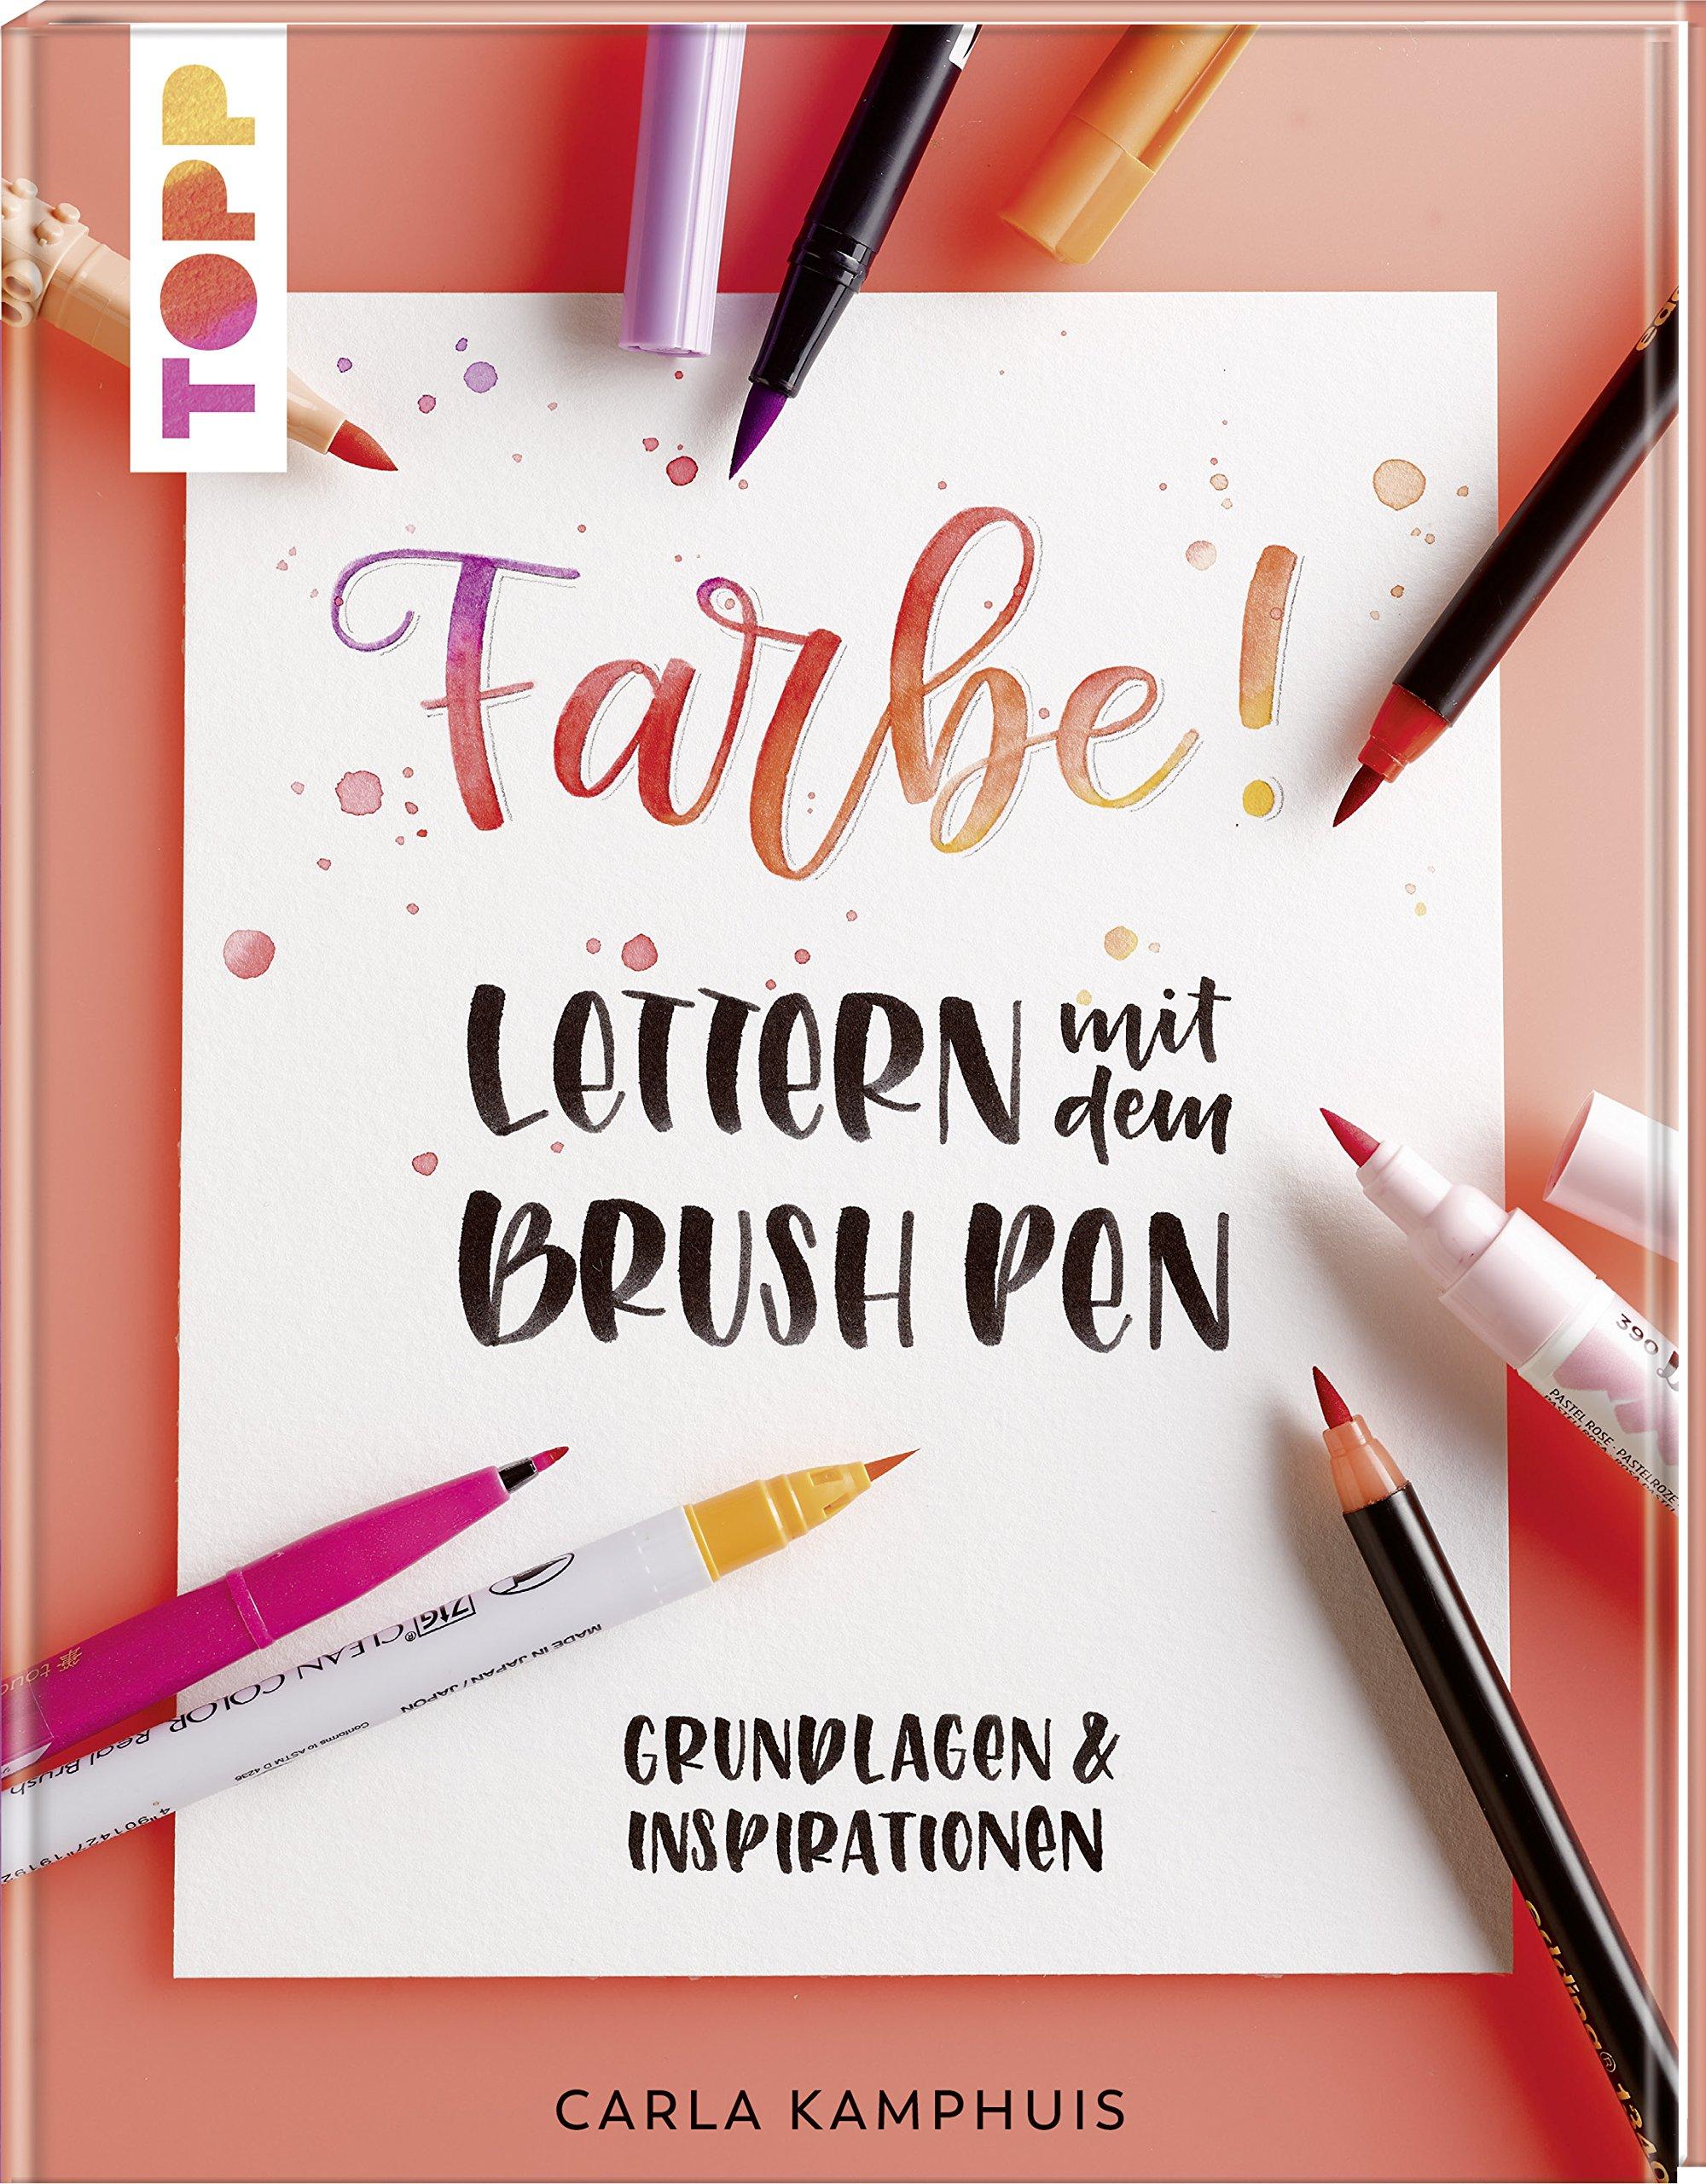 Farbe! Lettern mit dem Brush Pen: Grundlagen & Inspirationen